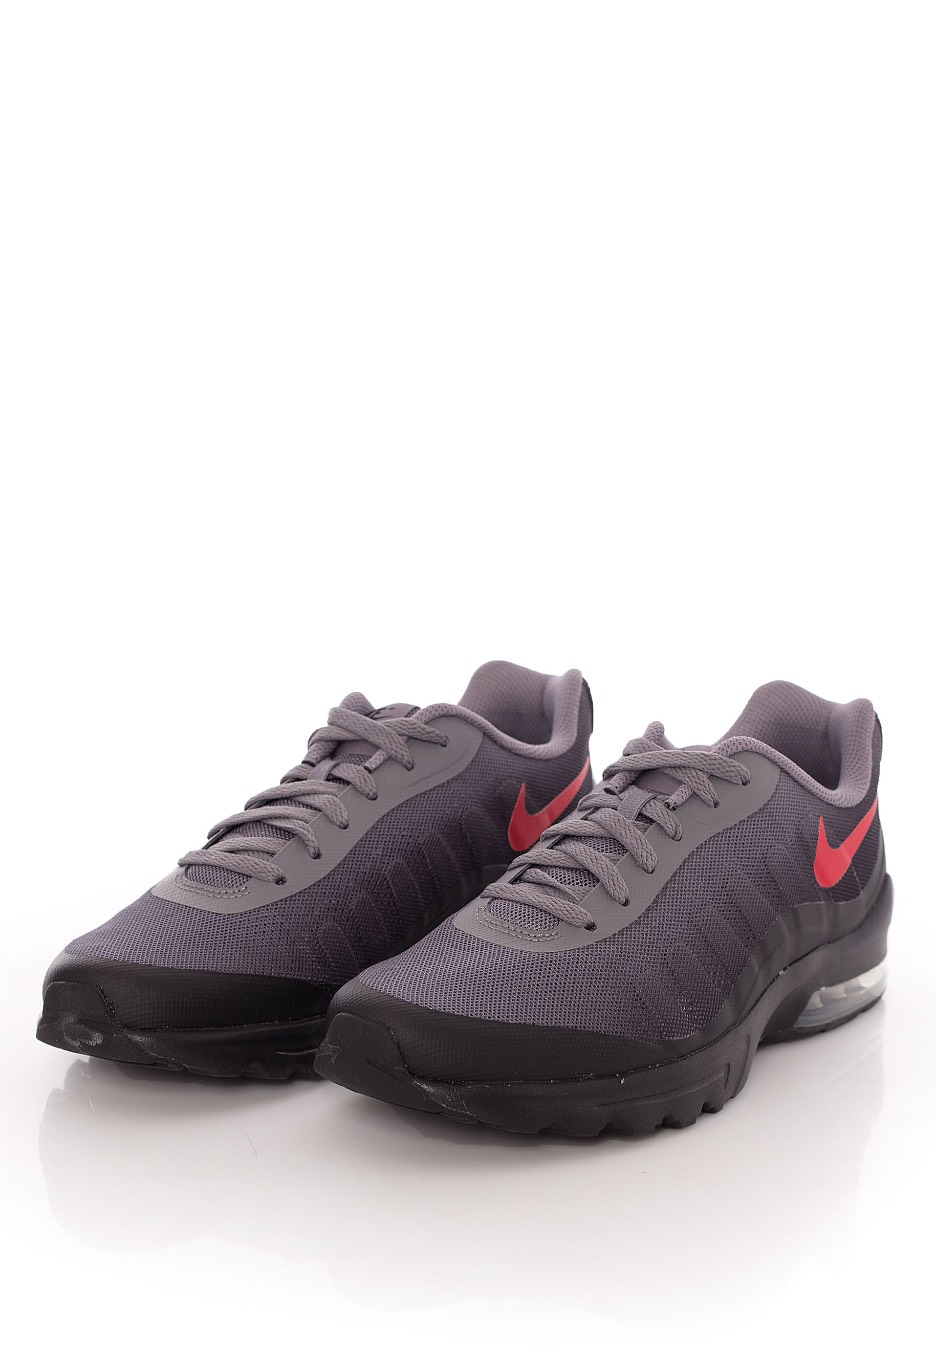 ... Nike - Air Max Invigor Print Gunsmoke University Red Black - Shoes ... d4ae2e199